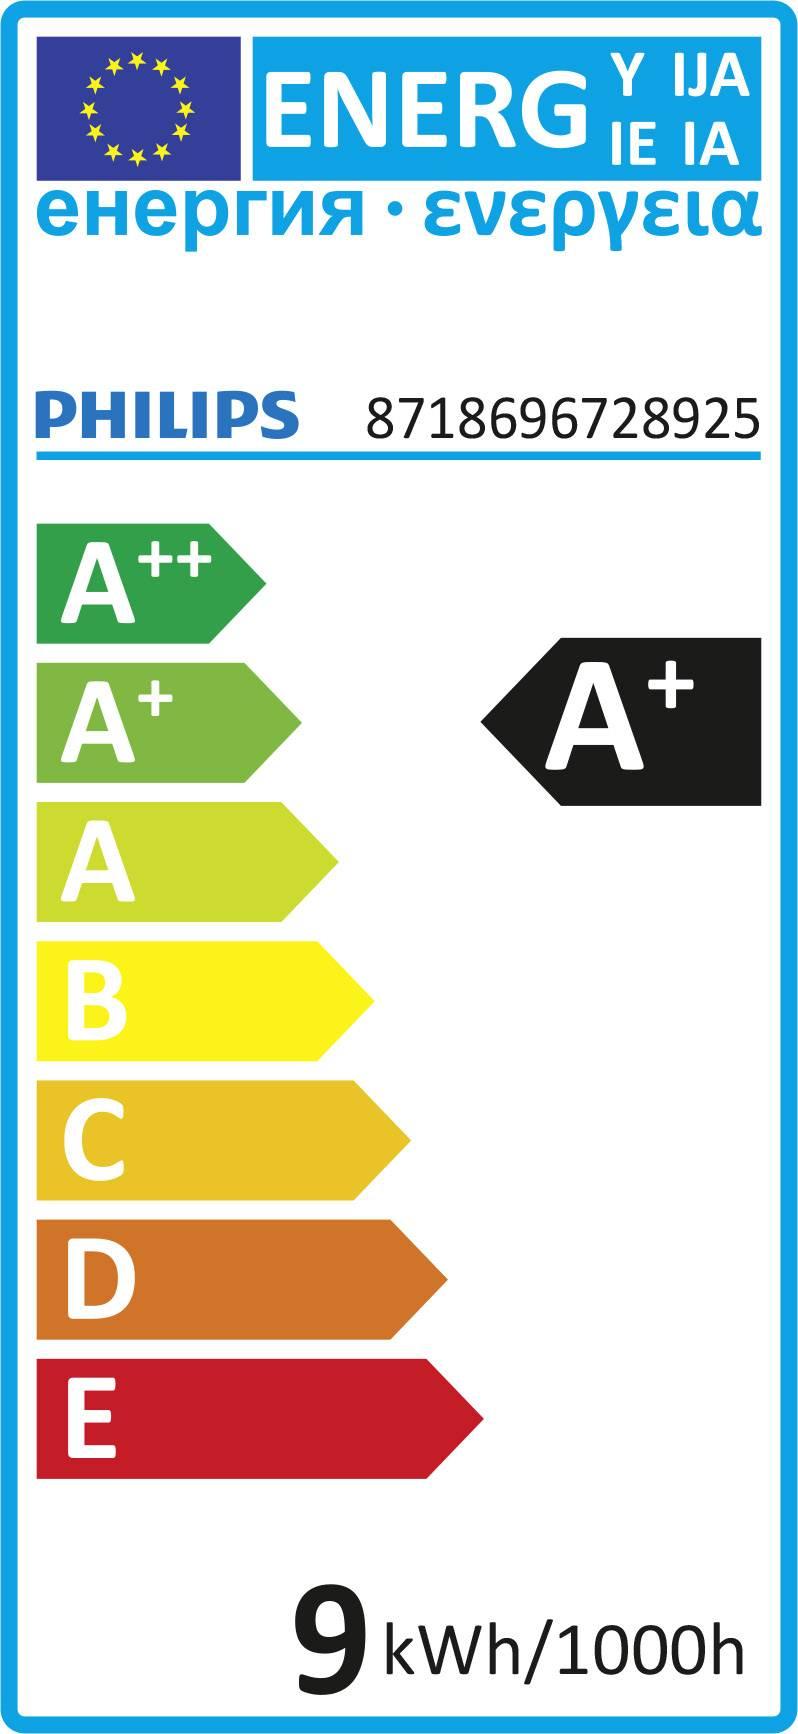 Energieeffizienzklasse A+